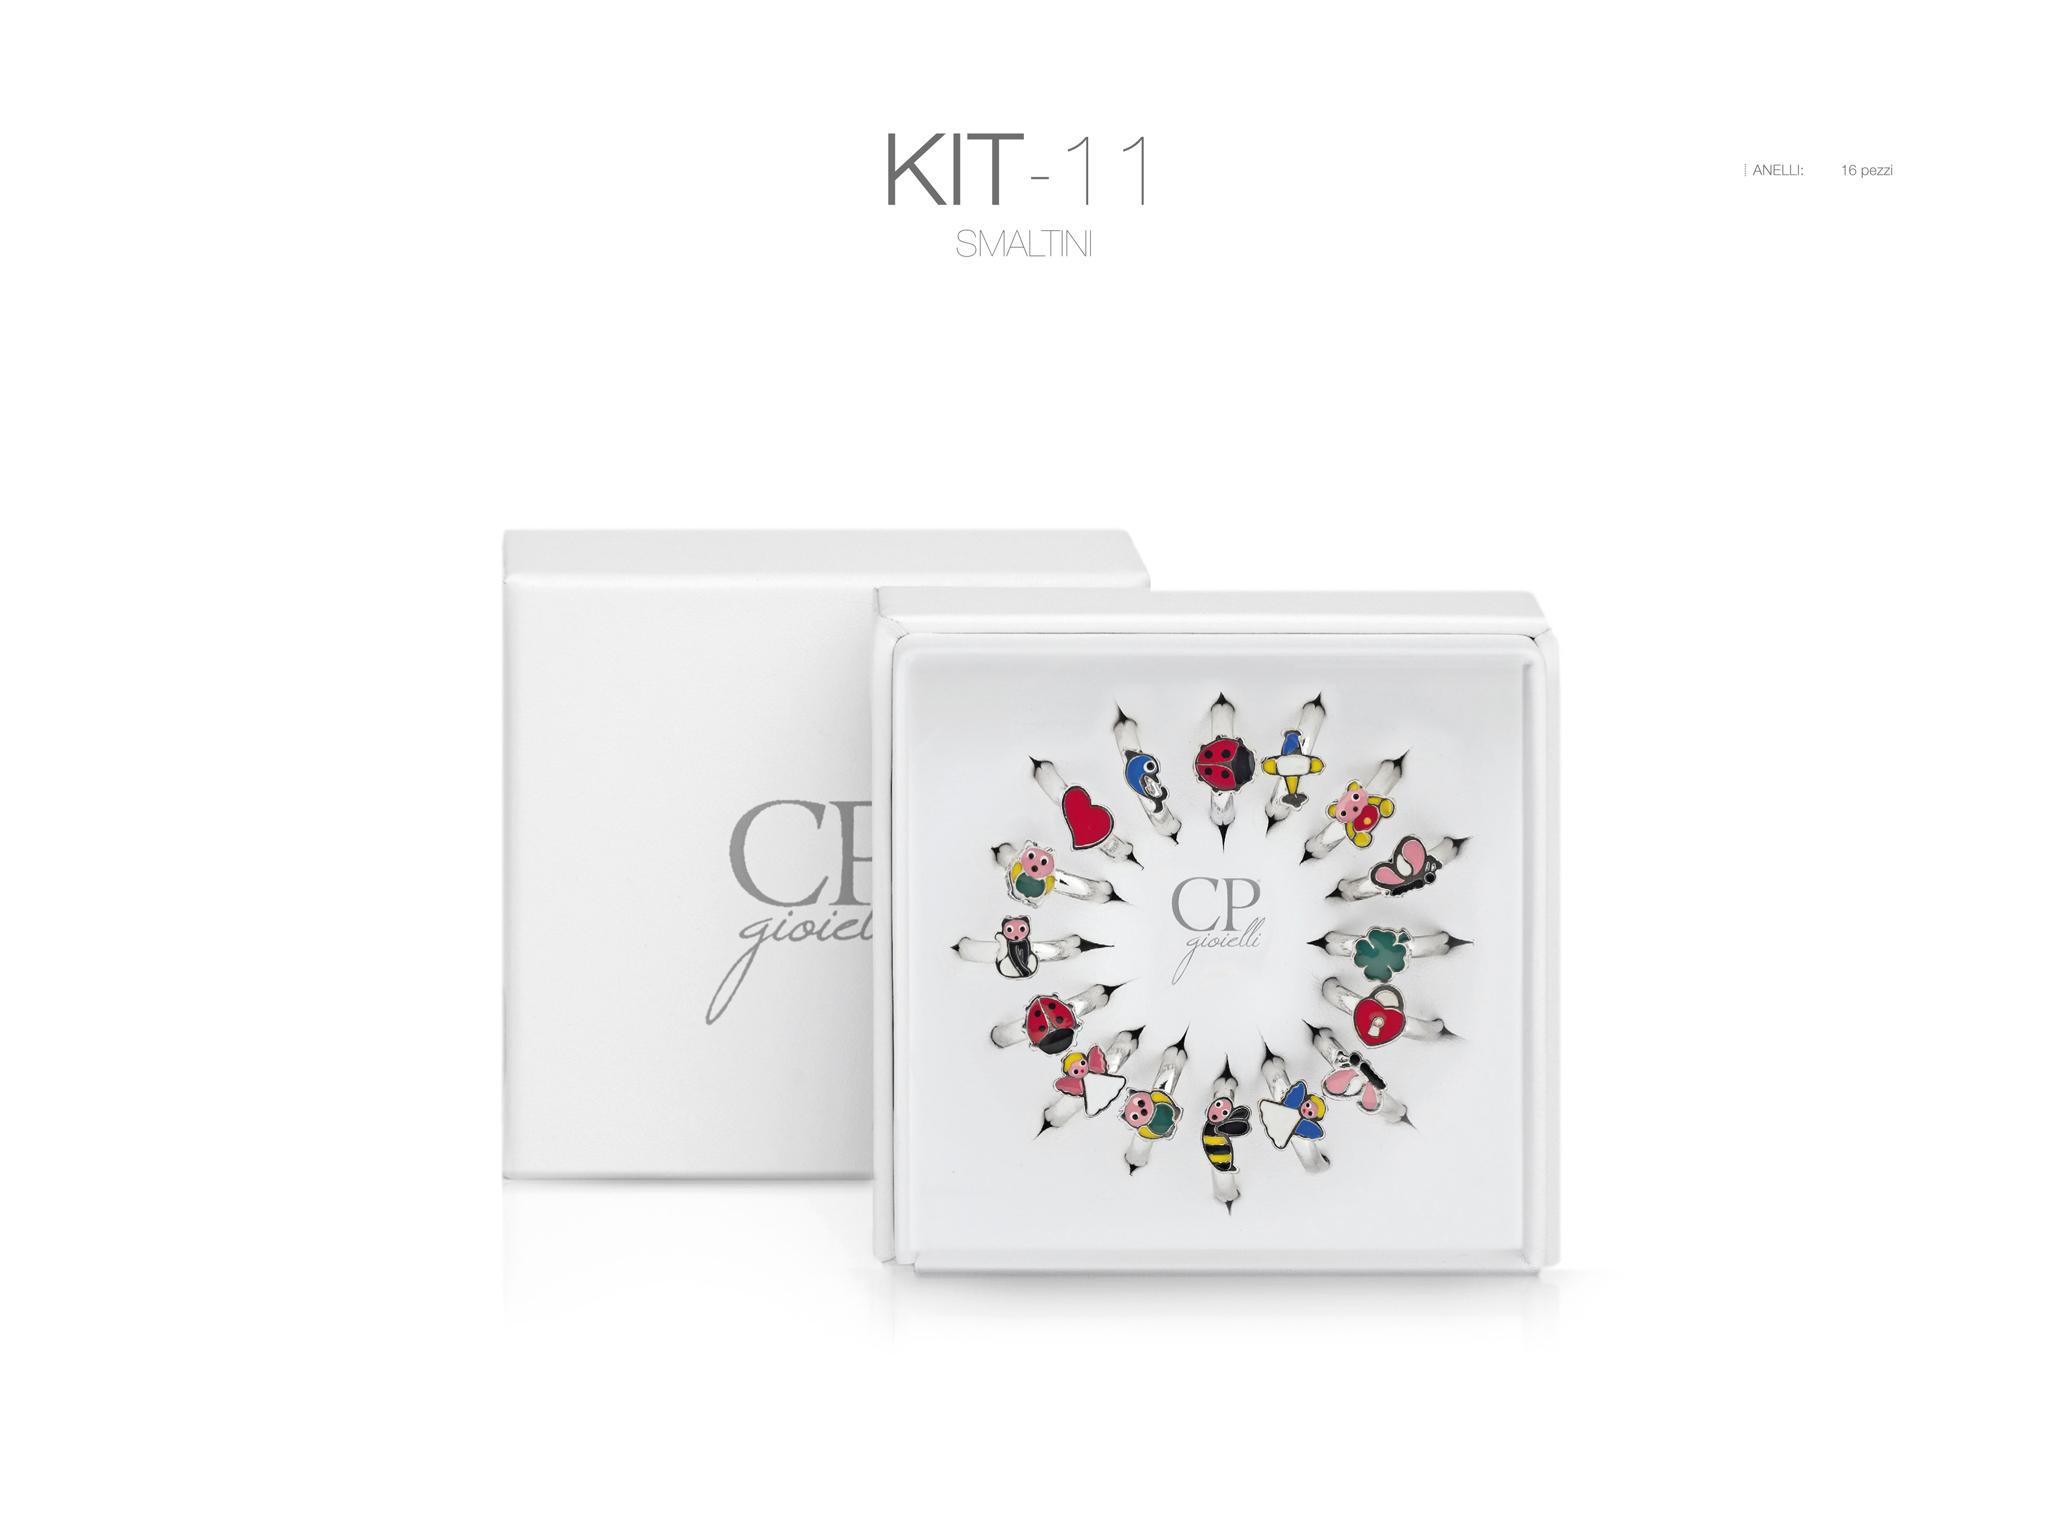 kit_argento_2-0_2016_pagina_41_app